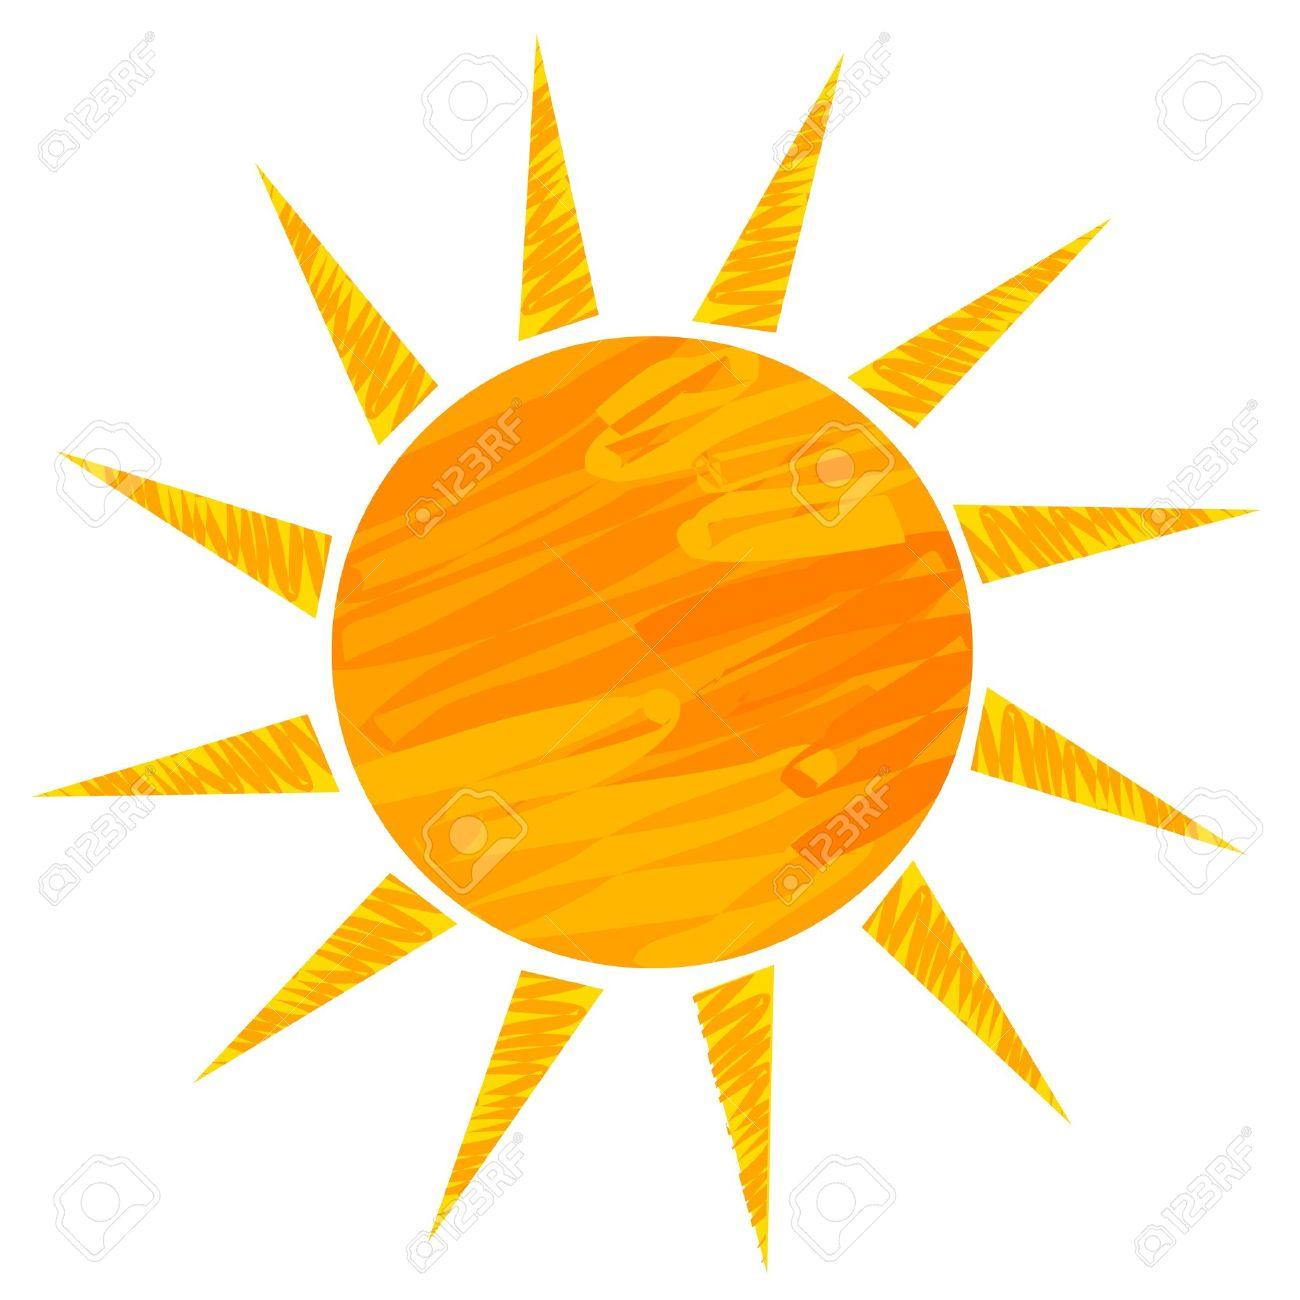 sun drawing vector illustration royalty free cliparts vectors and rh 123rf com Sunshine Border Clip Art Sunshine Graphic